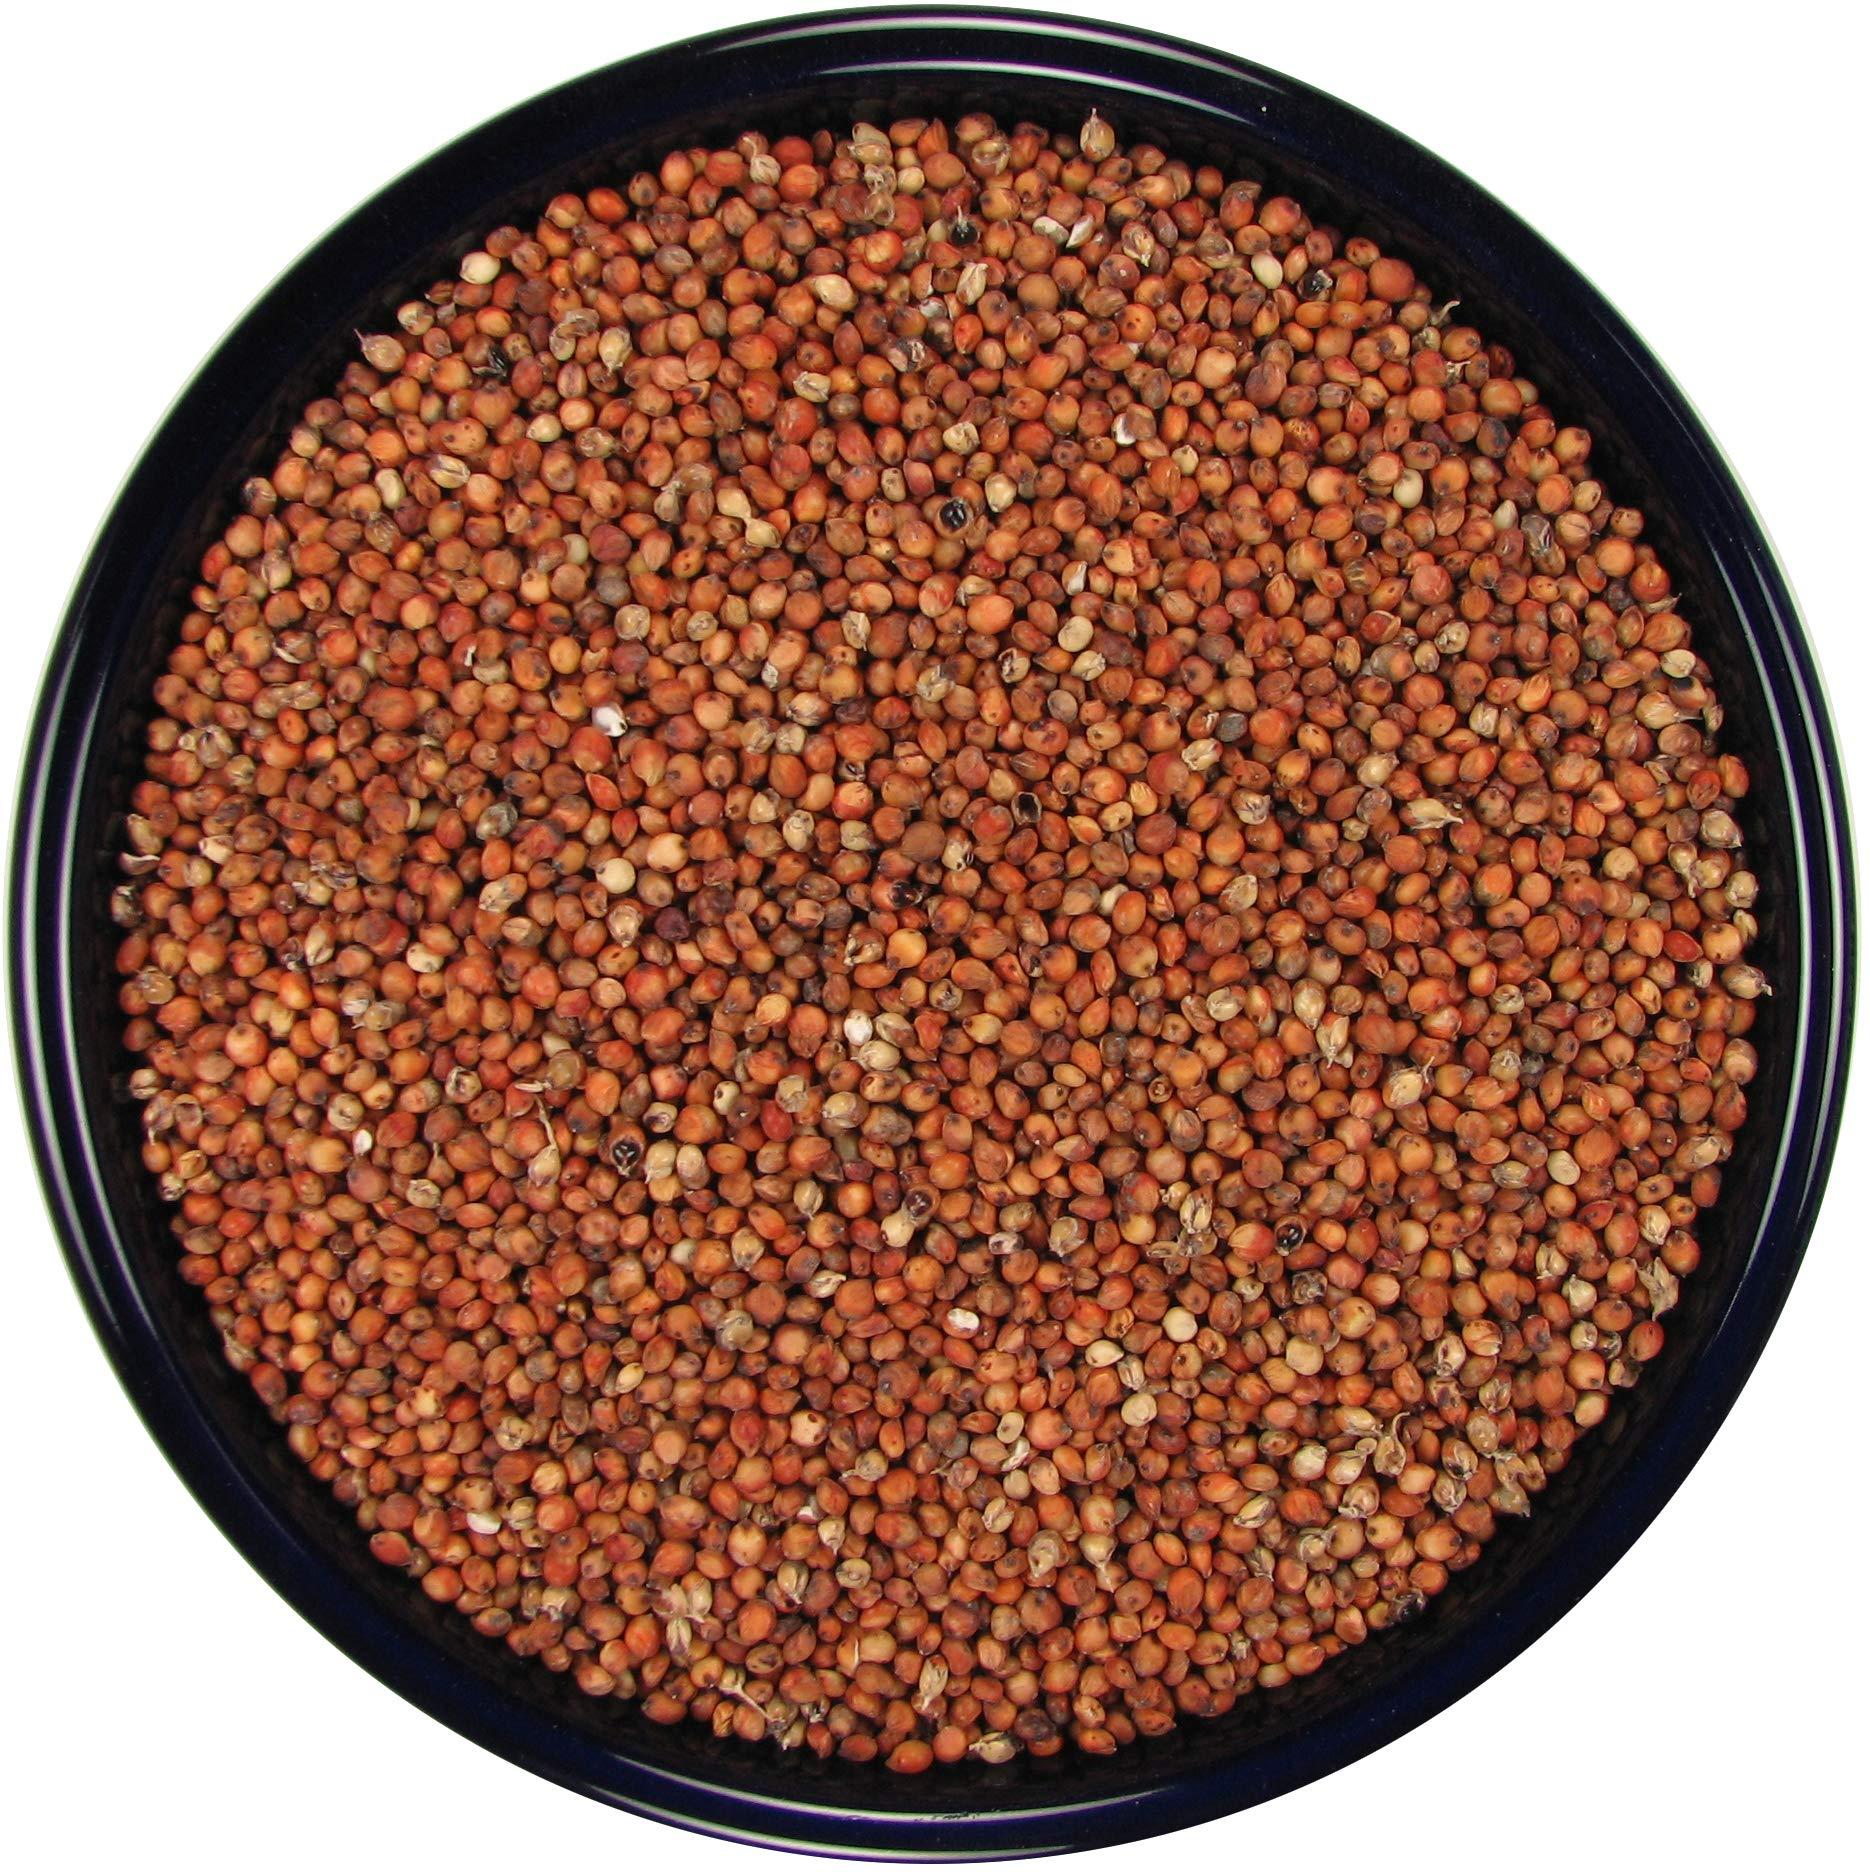 SLEEK & SASSY NUTRITIONAL DIET All Natural Milo (20 lbs.) by SLEEK & SASSY NUTRITIONAL DIET